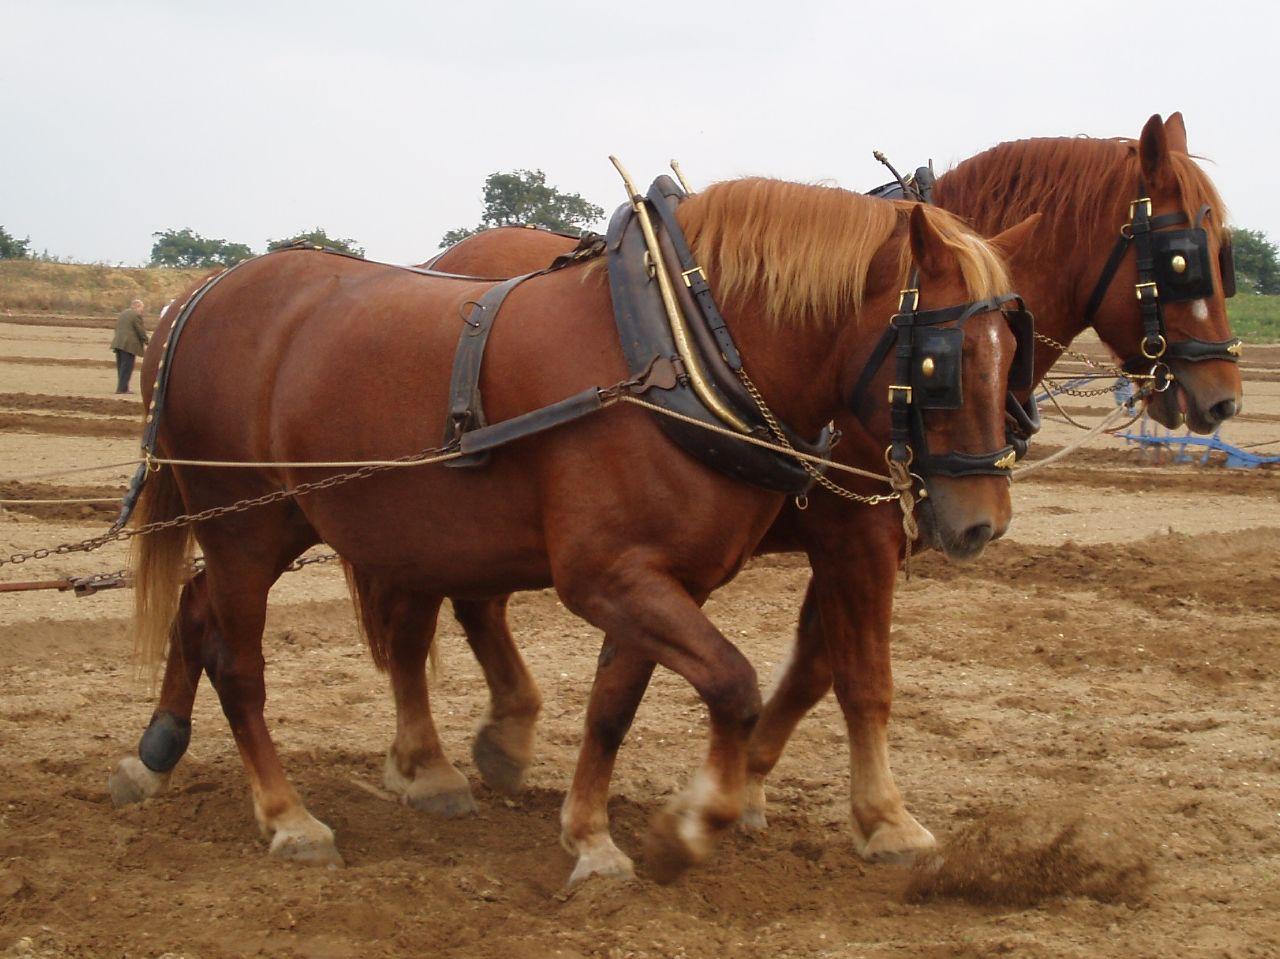 http://upload.wikimedia.org/wikipedia/commons/7/7f/Suffolk_horses_ploughing.jpg